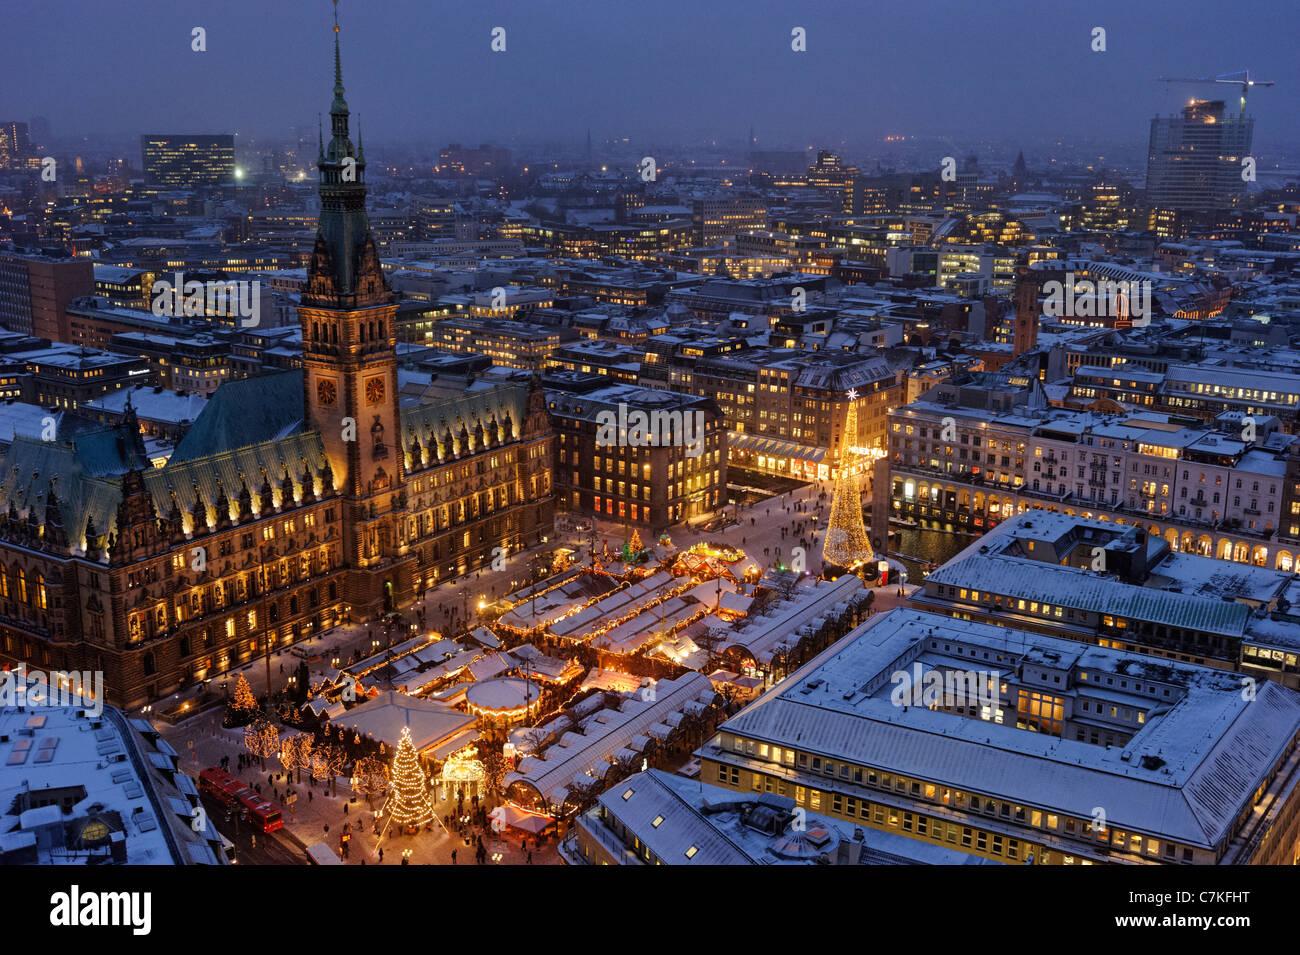 Traditional Hamburg Christmas Market, Rathausmarkt square, Town Hall, snow, city, Hamburg, Germany, Europe - Stock Image